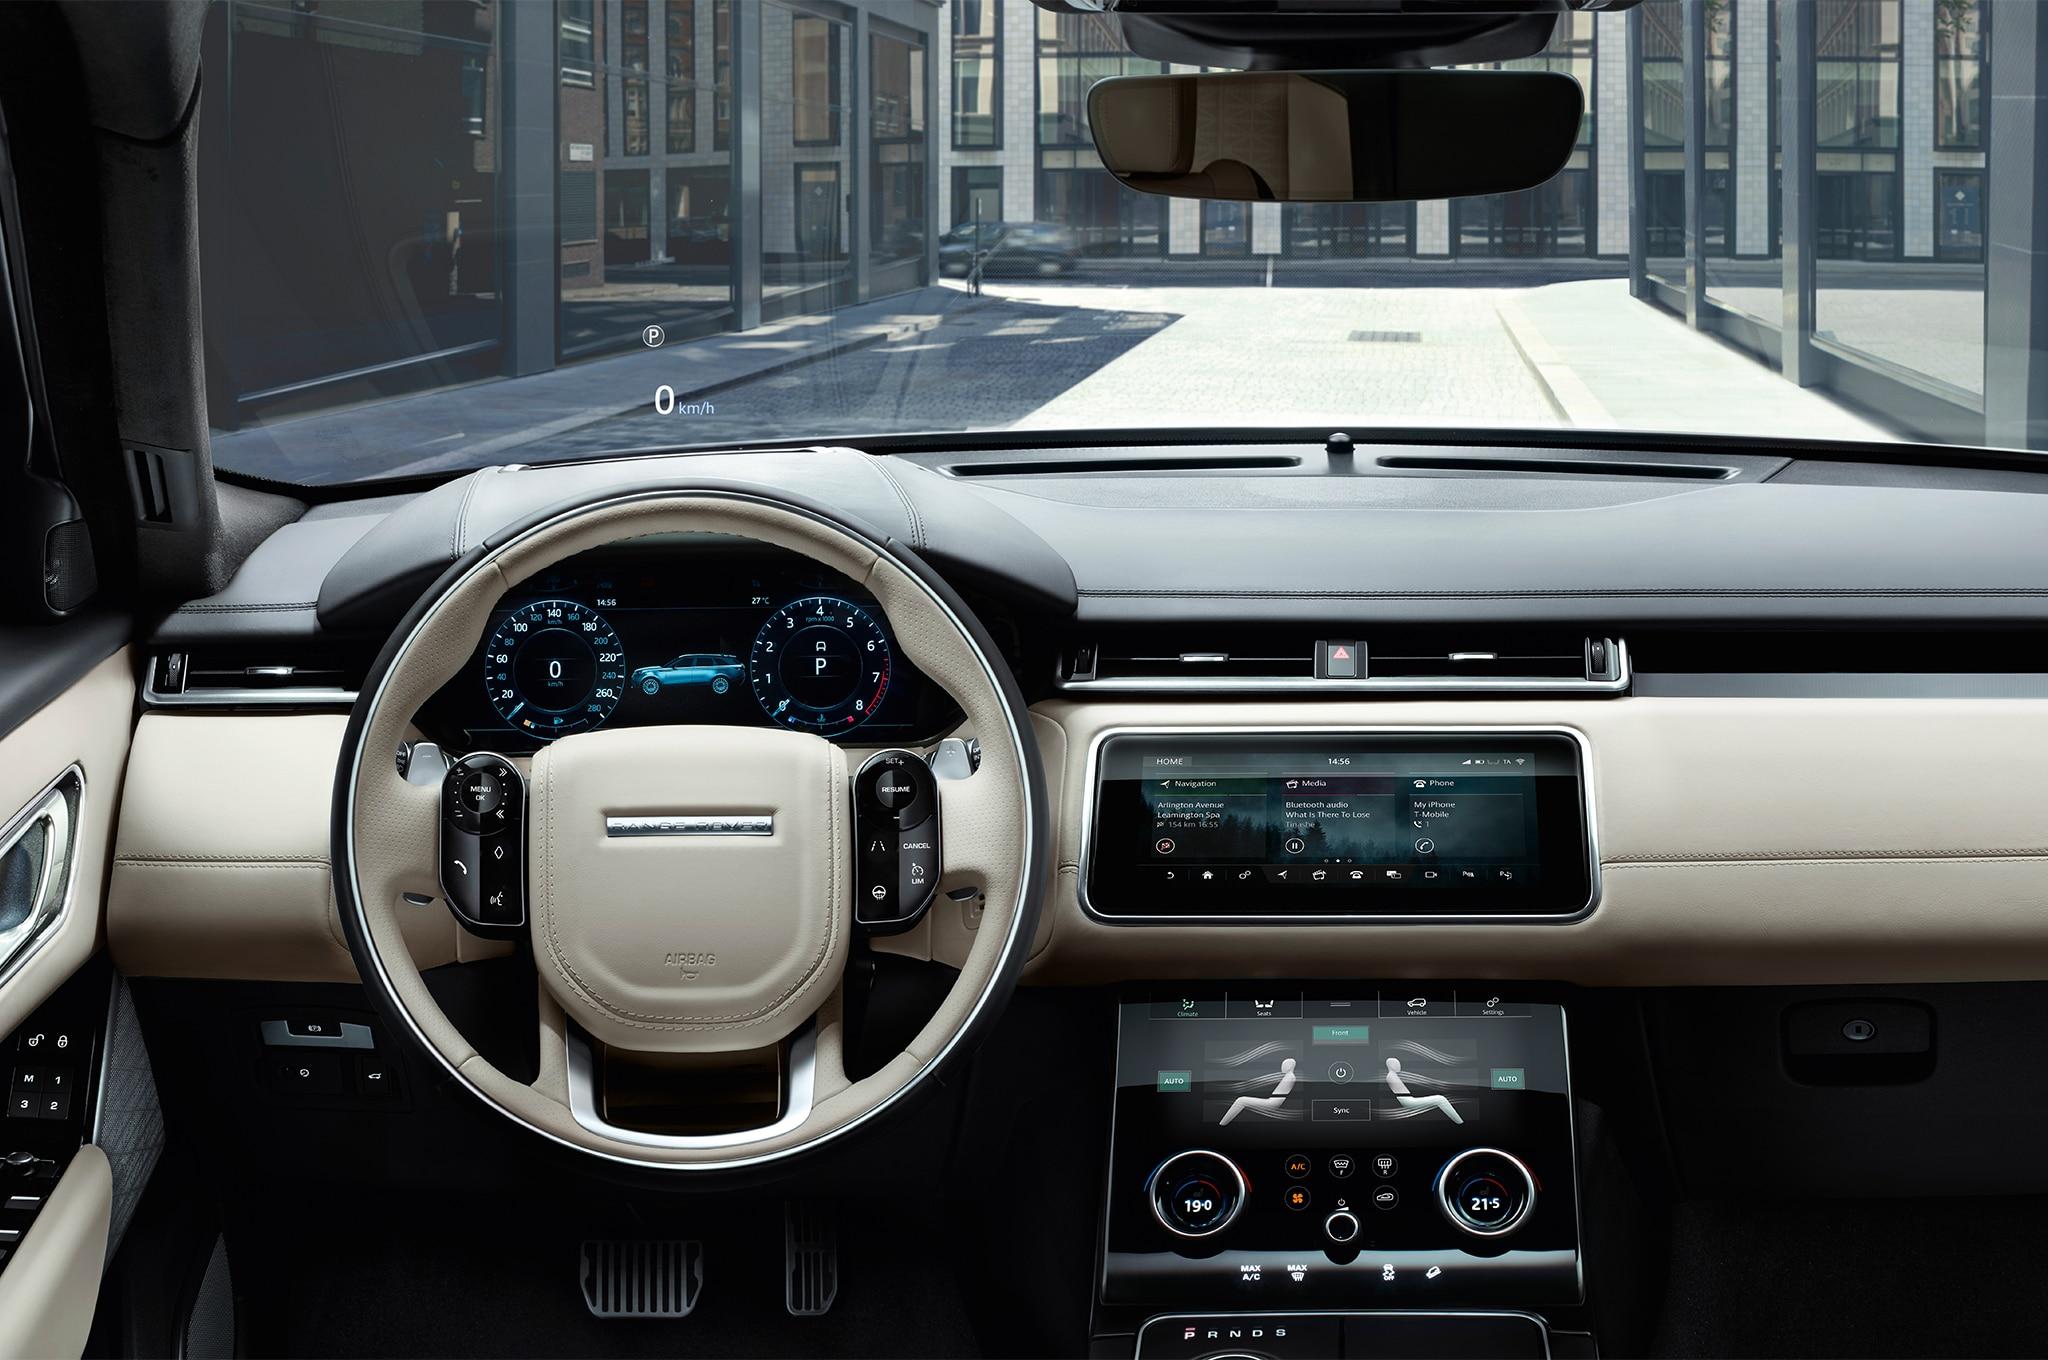 Range Rover Velar 2018 Interior >> First Look: 2018 Range Rover Velar | Automobile Magazine